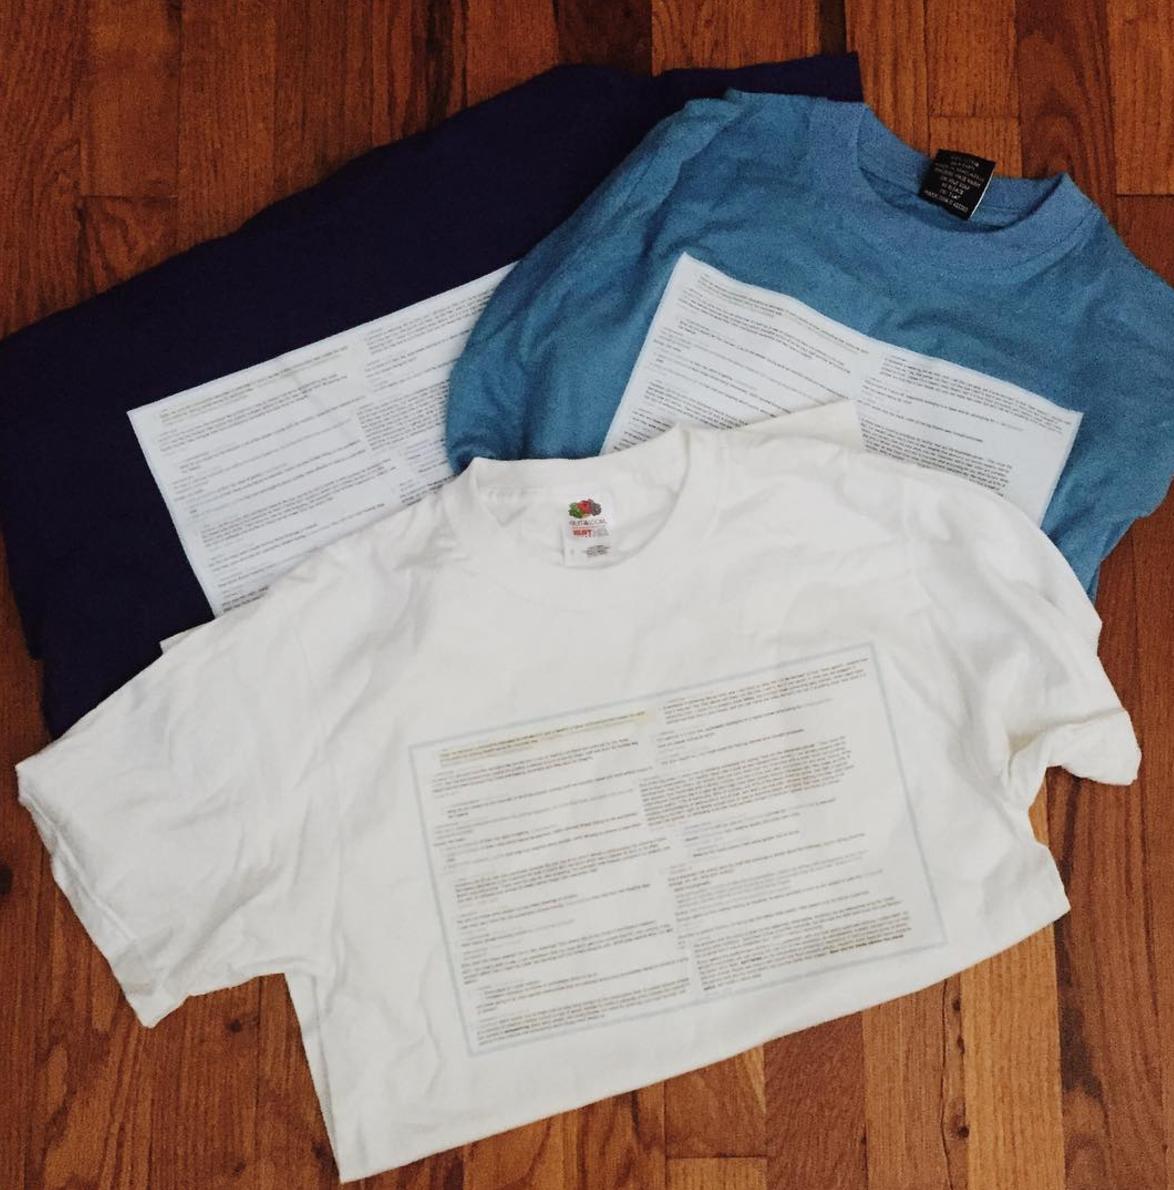 Printed tee shirts